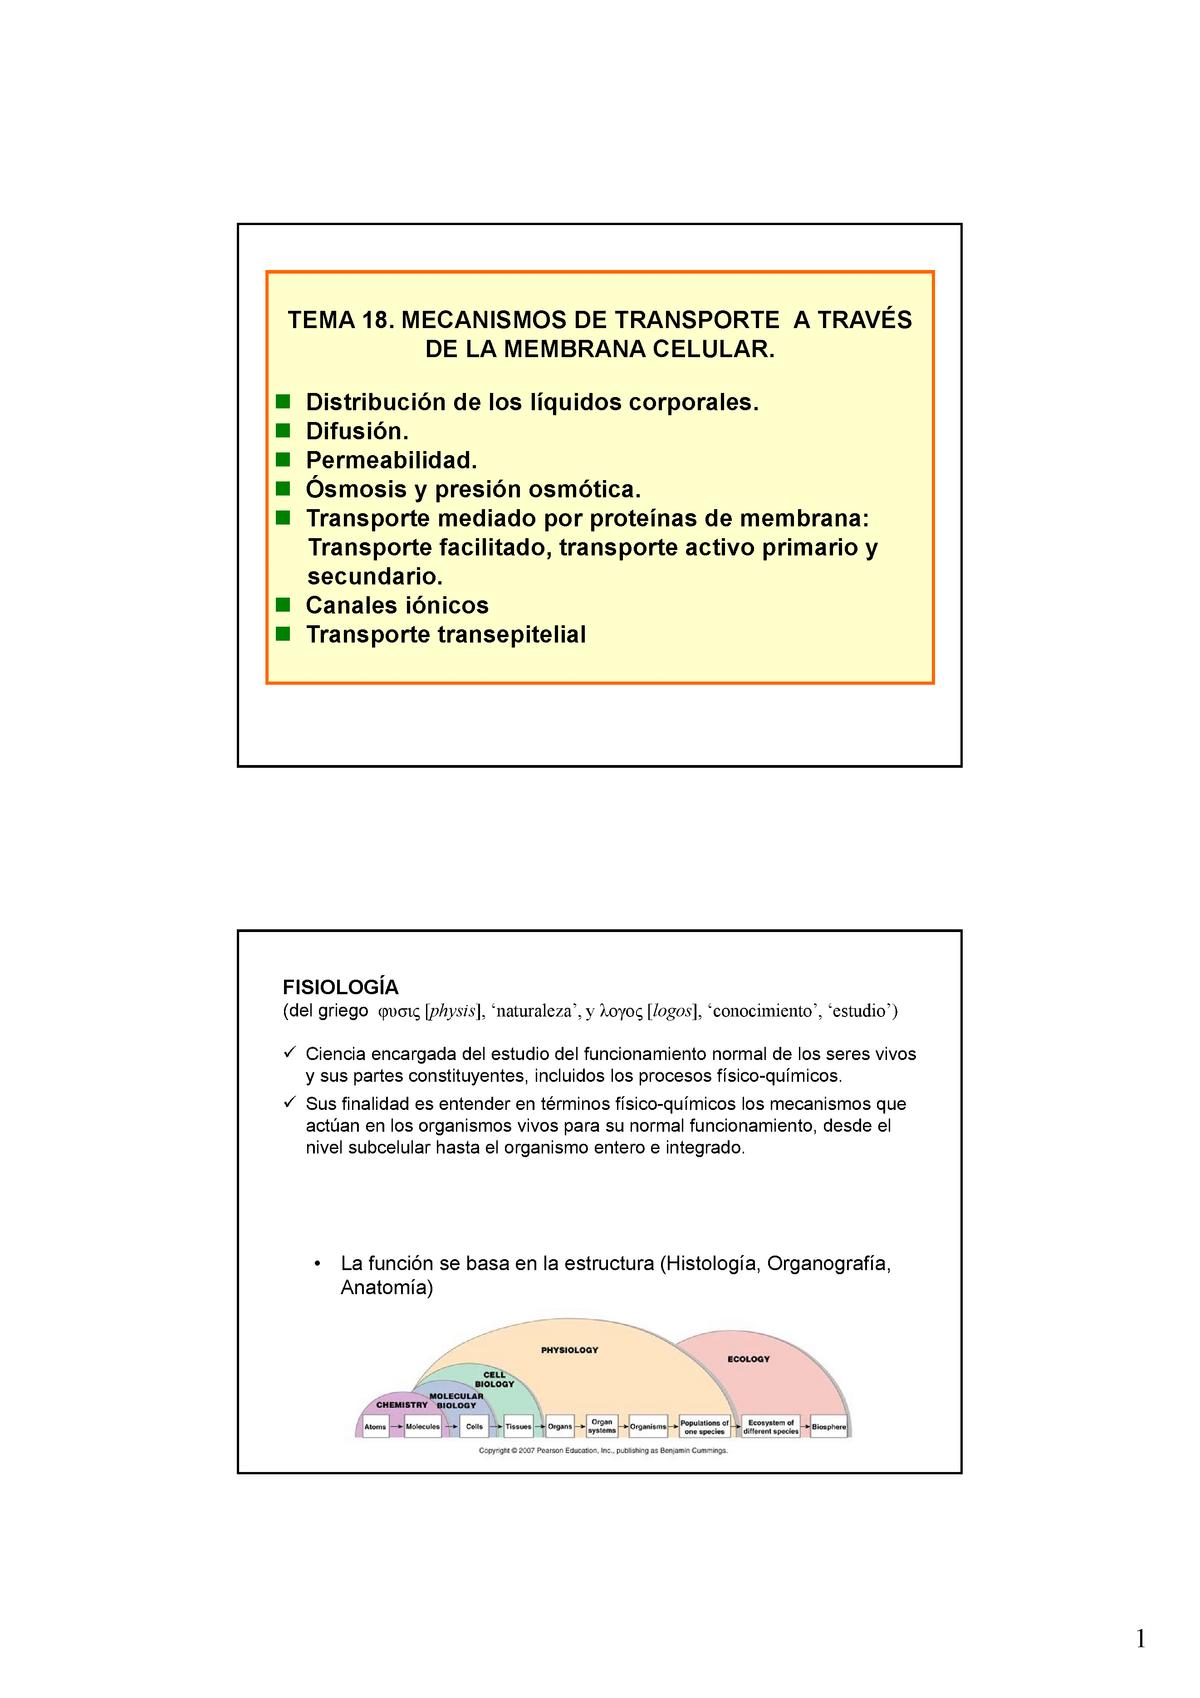 Tema18 Apuntes Tema 18 Biologia 45994 Uva Studocu